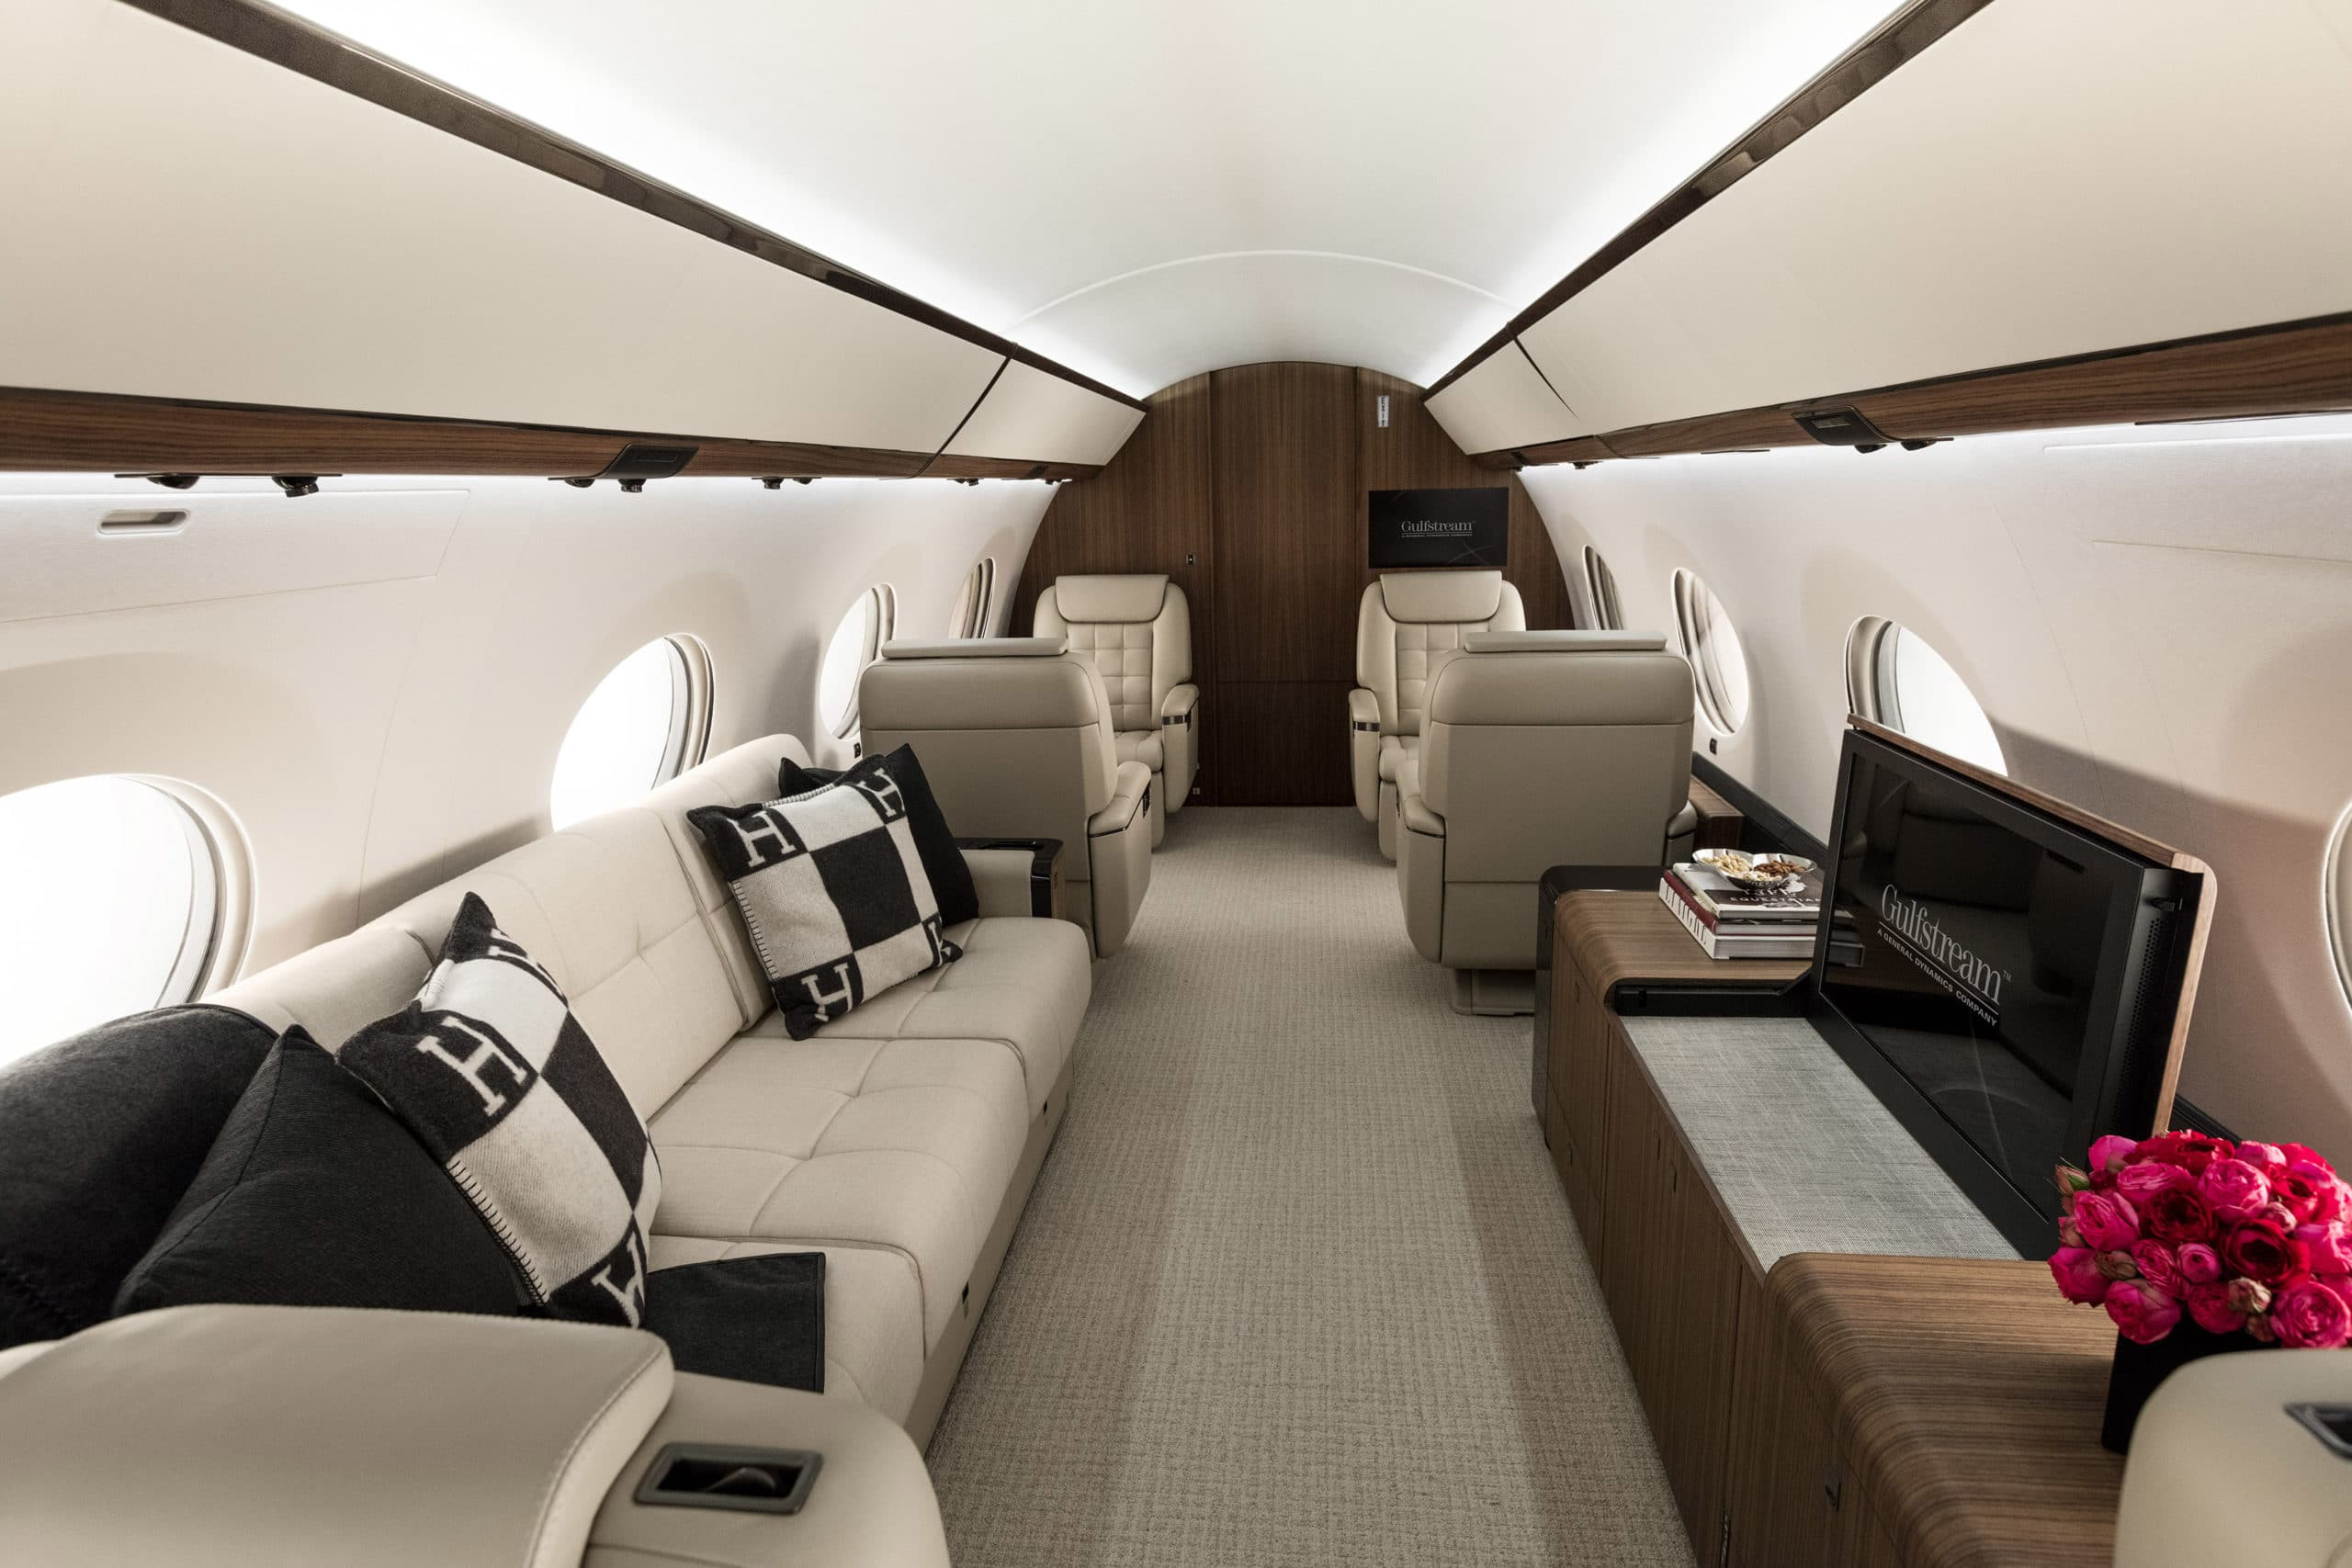 The Luxury Private Jet Interiors Aeroaffaires